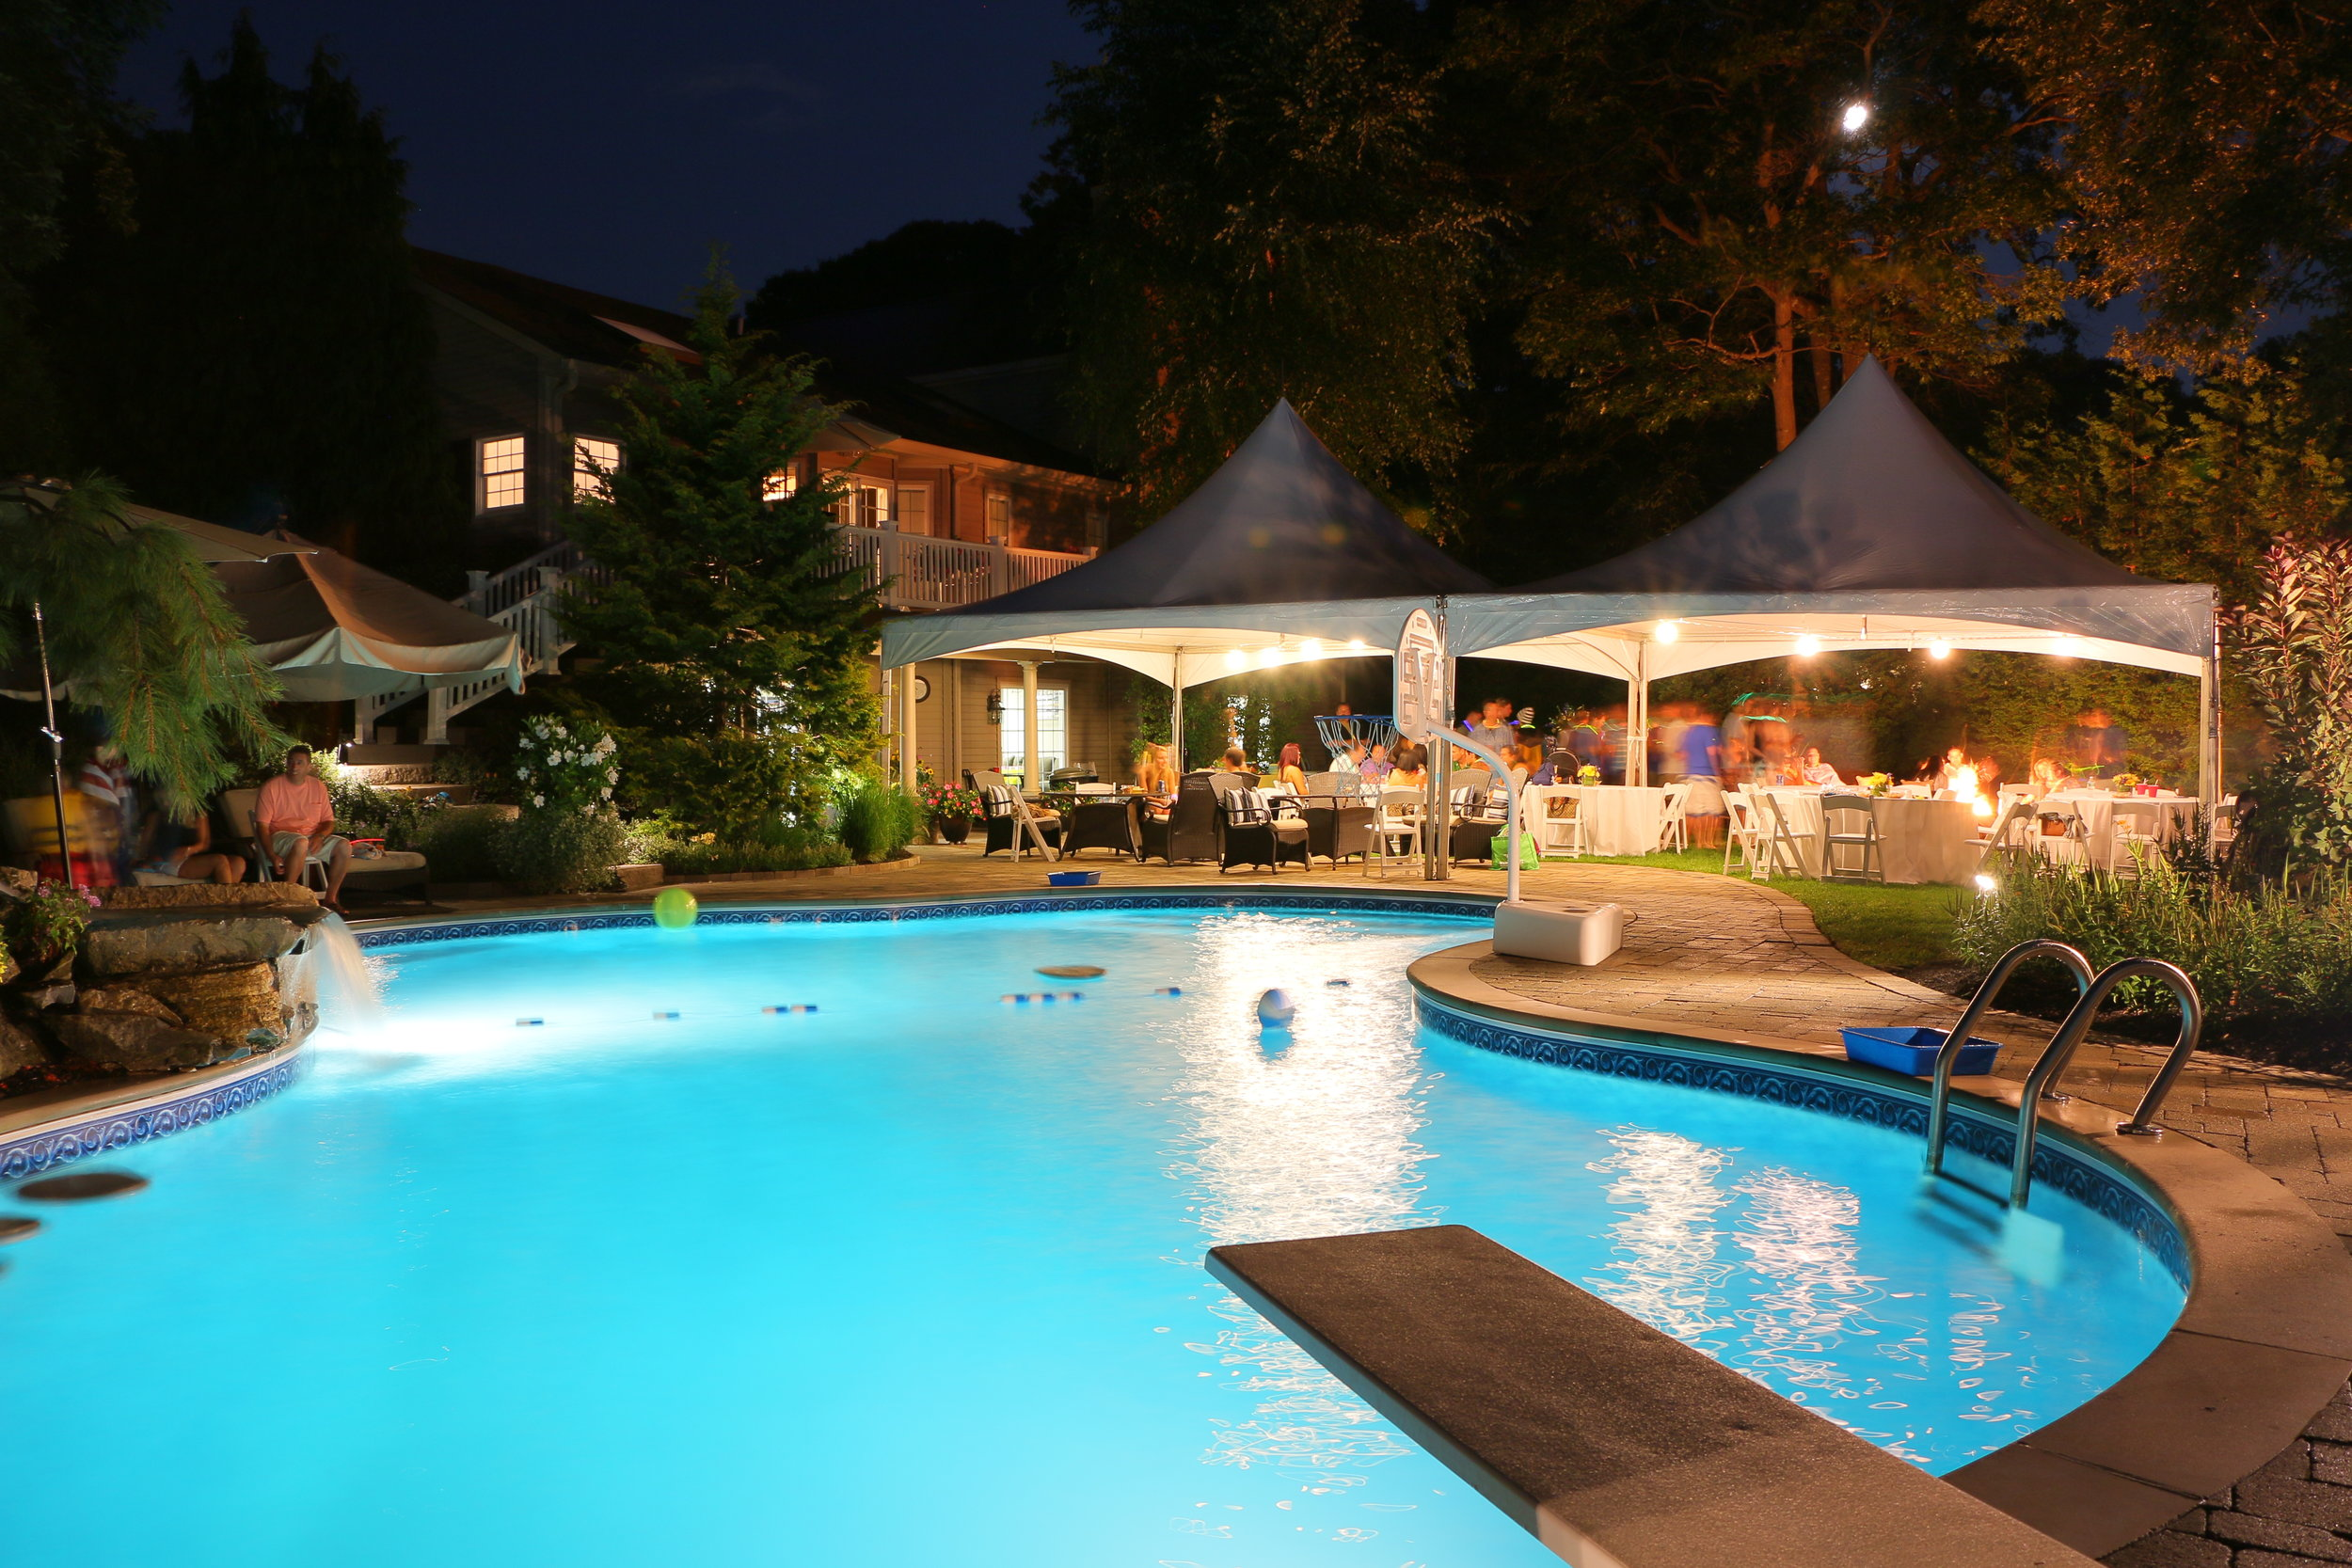 Backyard Resort    VIEW PROJECT